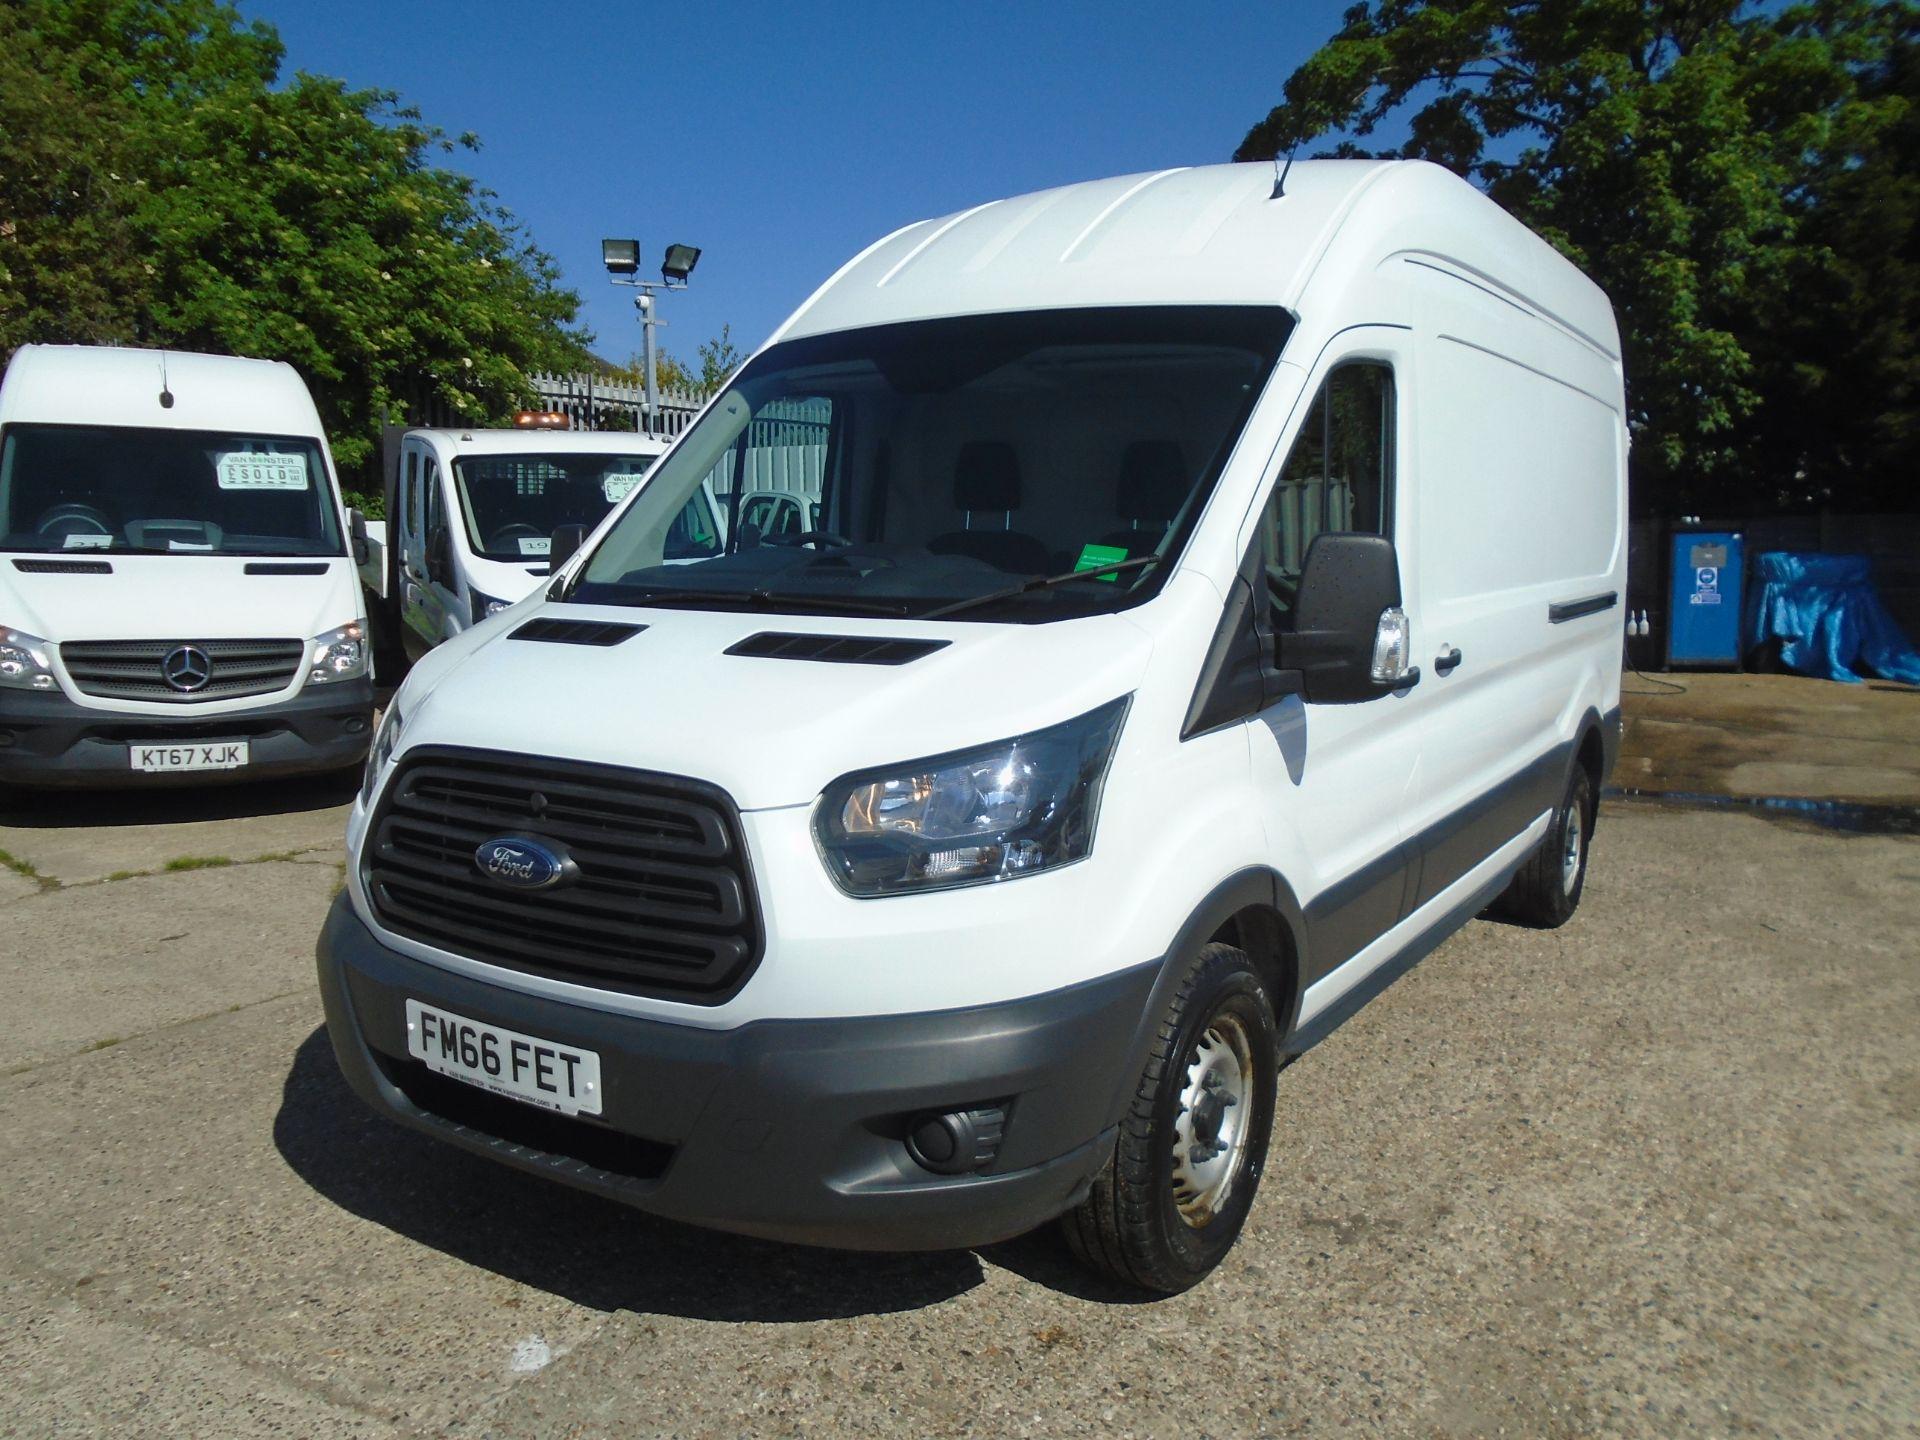 2016 Ford Transit 2.0 Tdci 130Ps H3 Van (FM66FET) Image 3